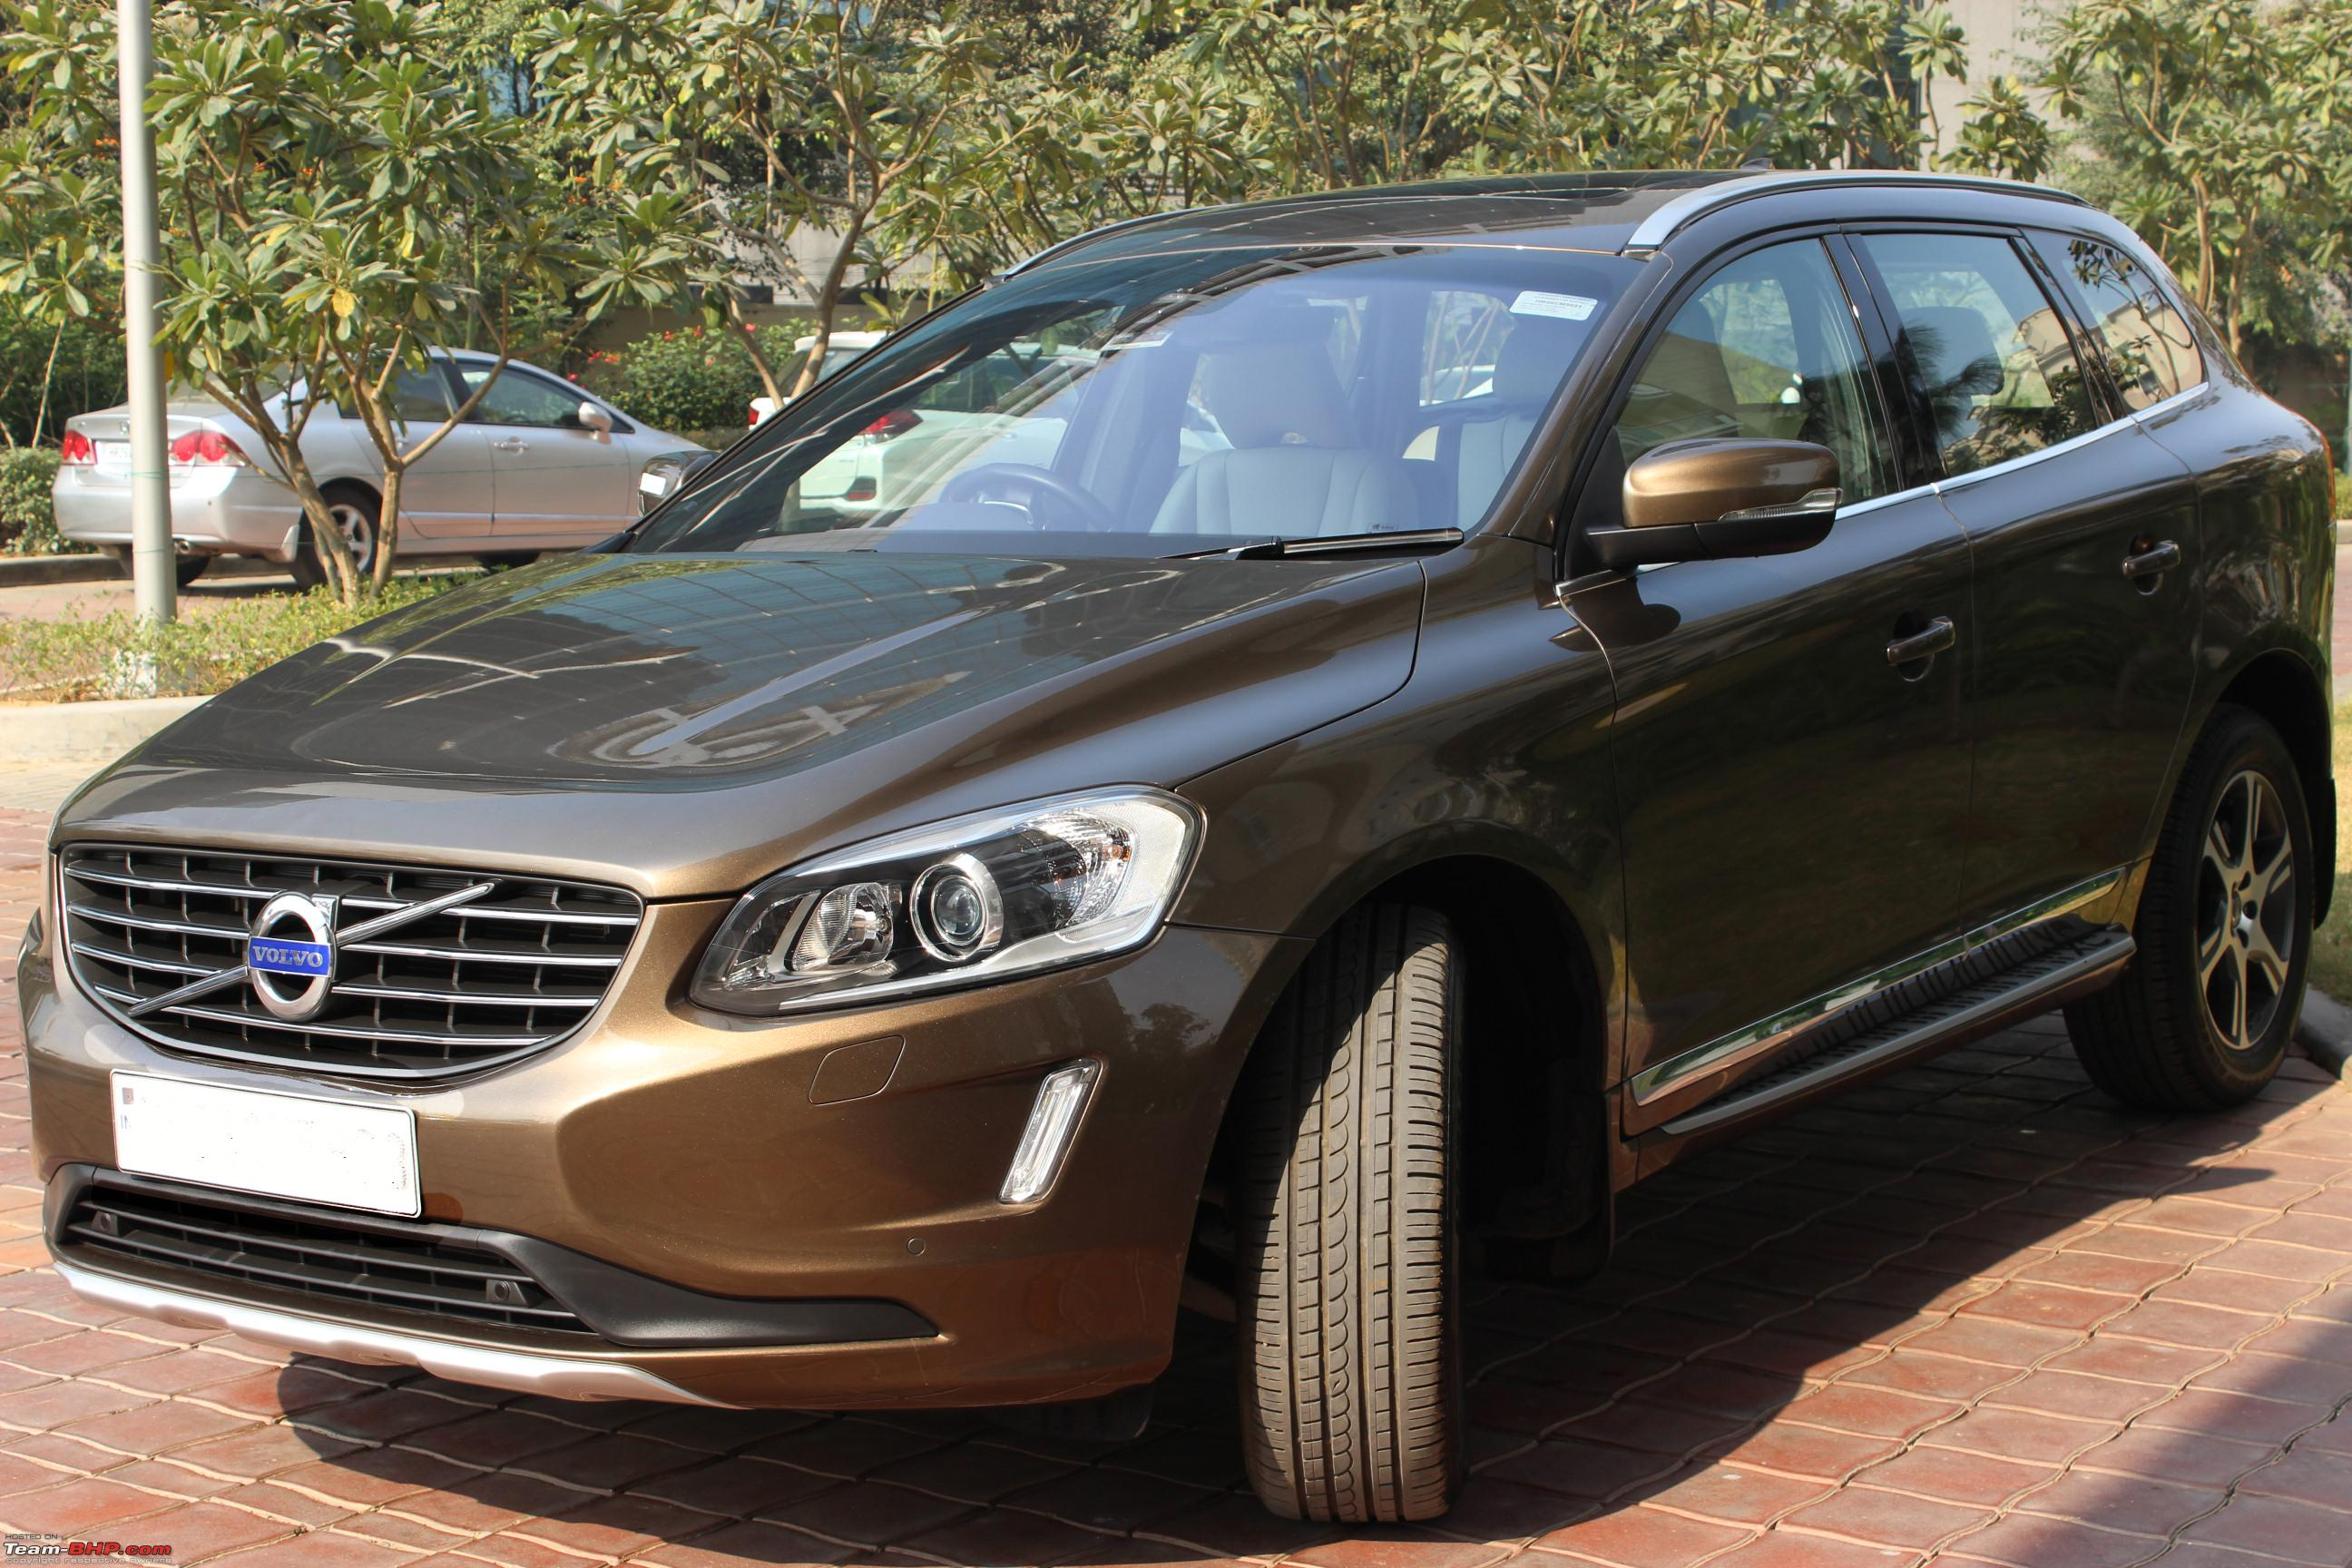 Volvo xc60 d5 summum awd edit 30 000 km update 2 jpg